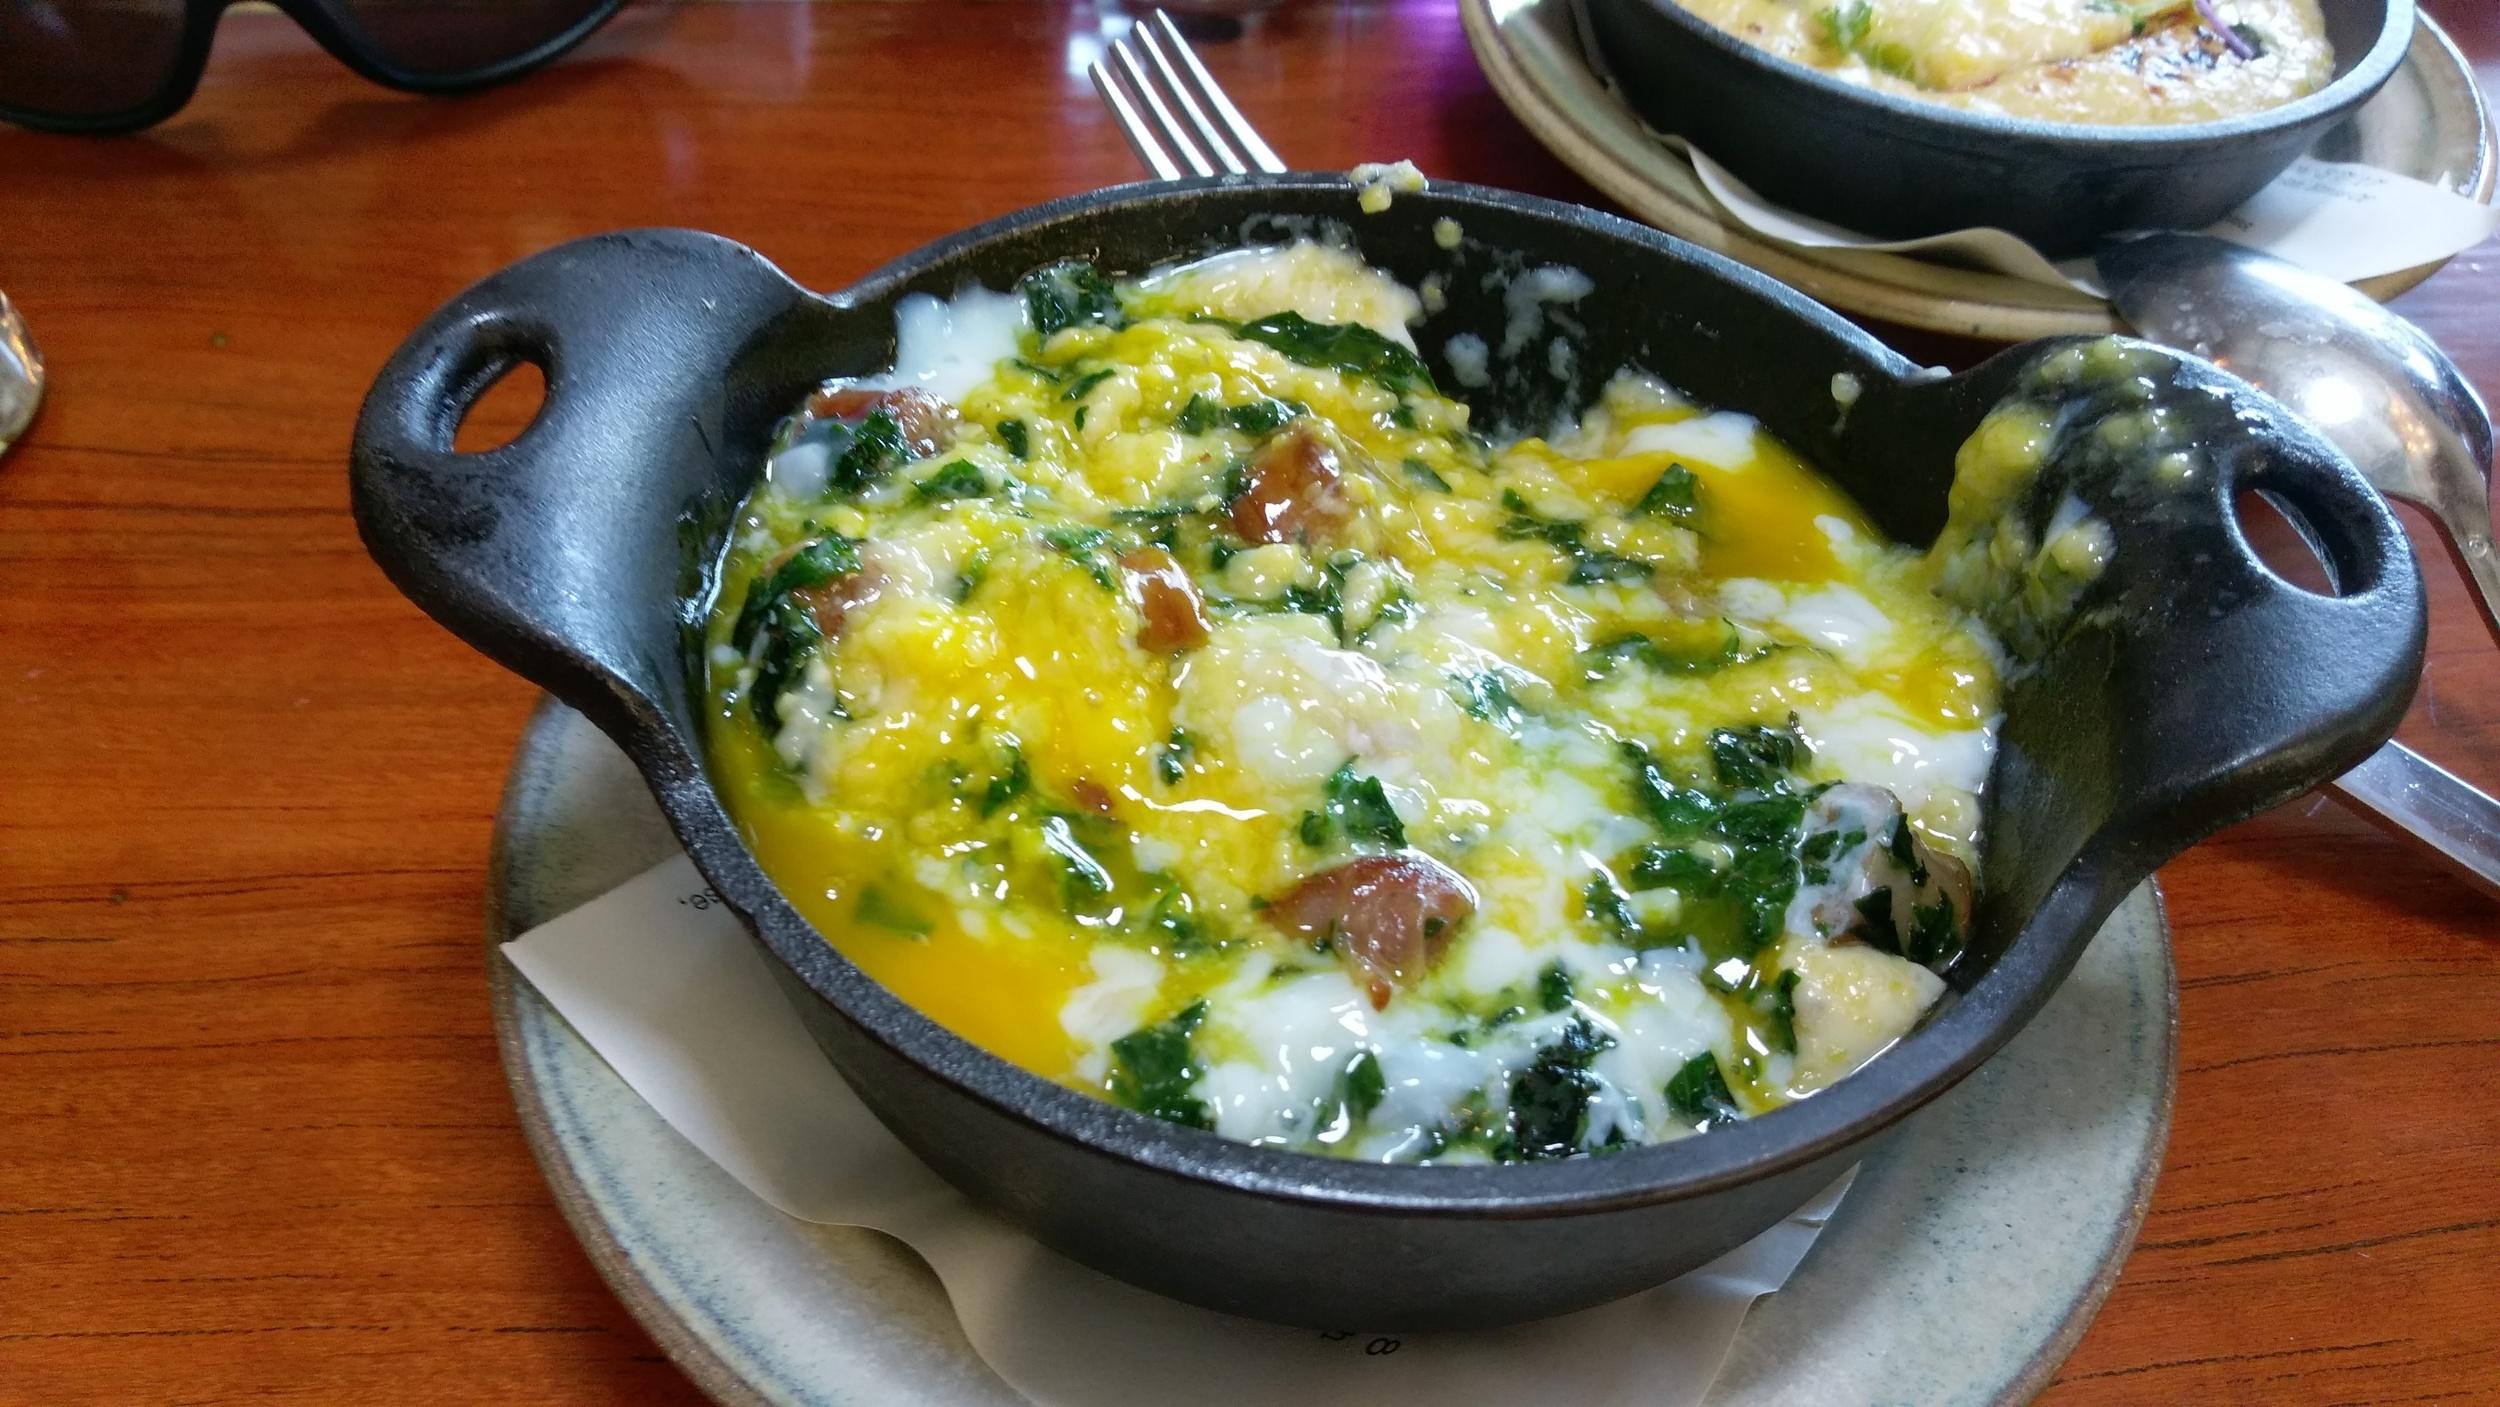 The Southern Breakfast basket